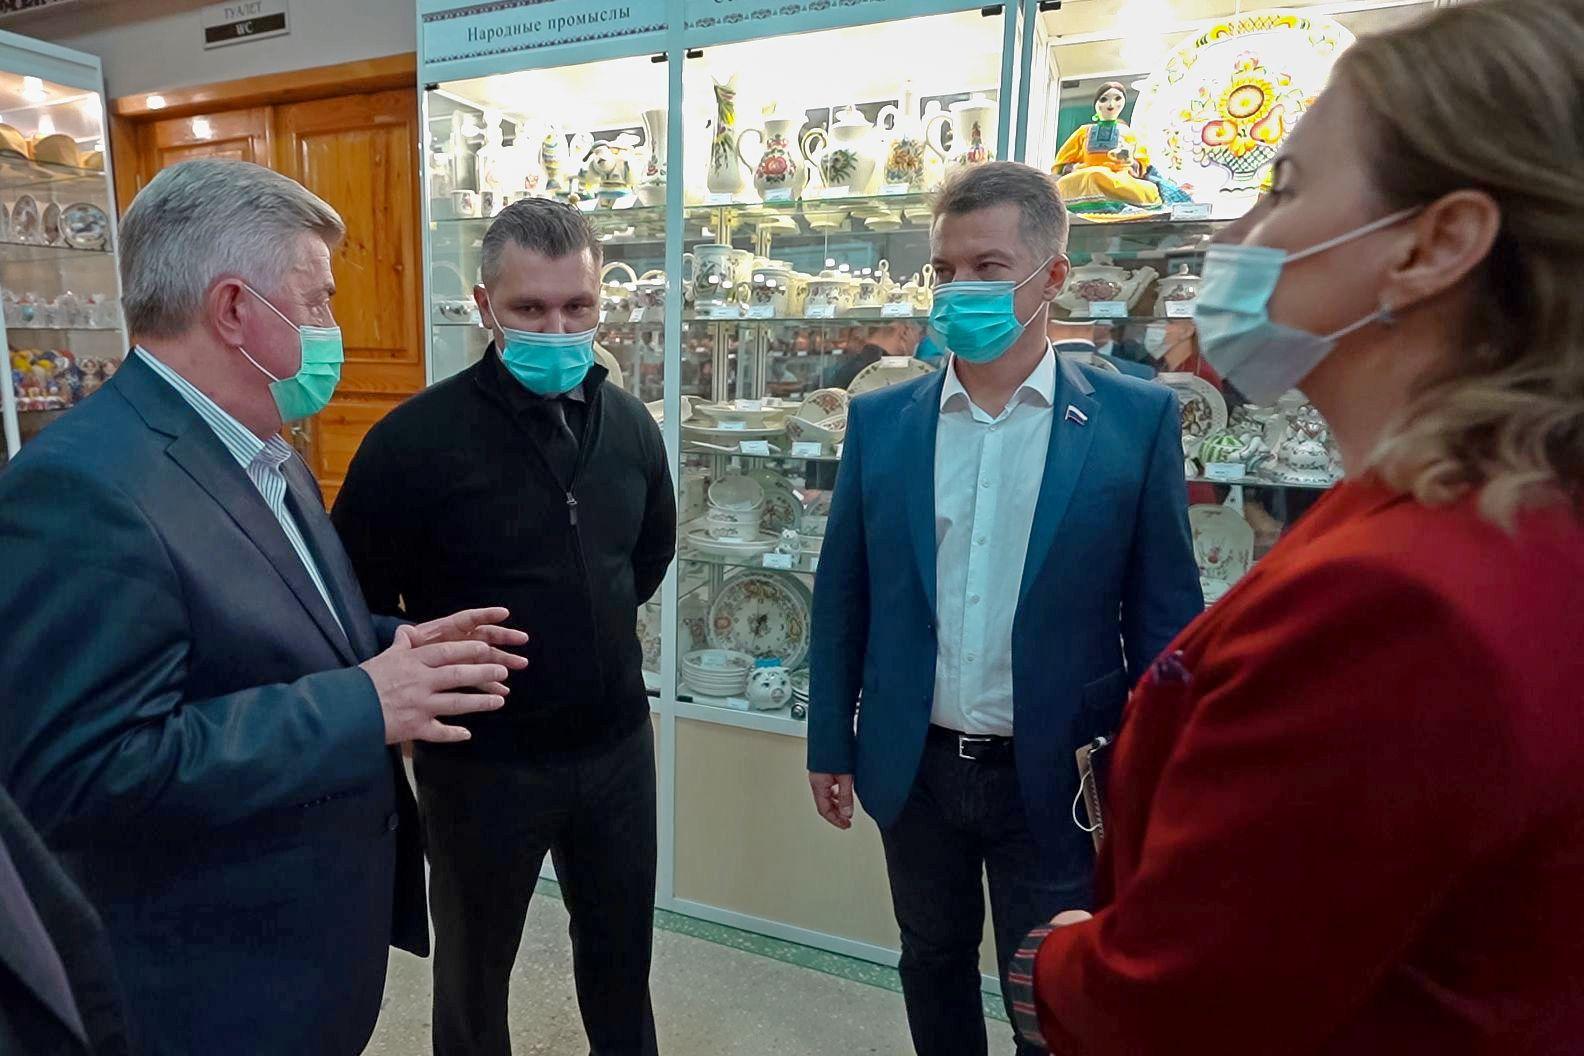 Выставка икон из Музея Рублева пройдет в сентябре в Азове